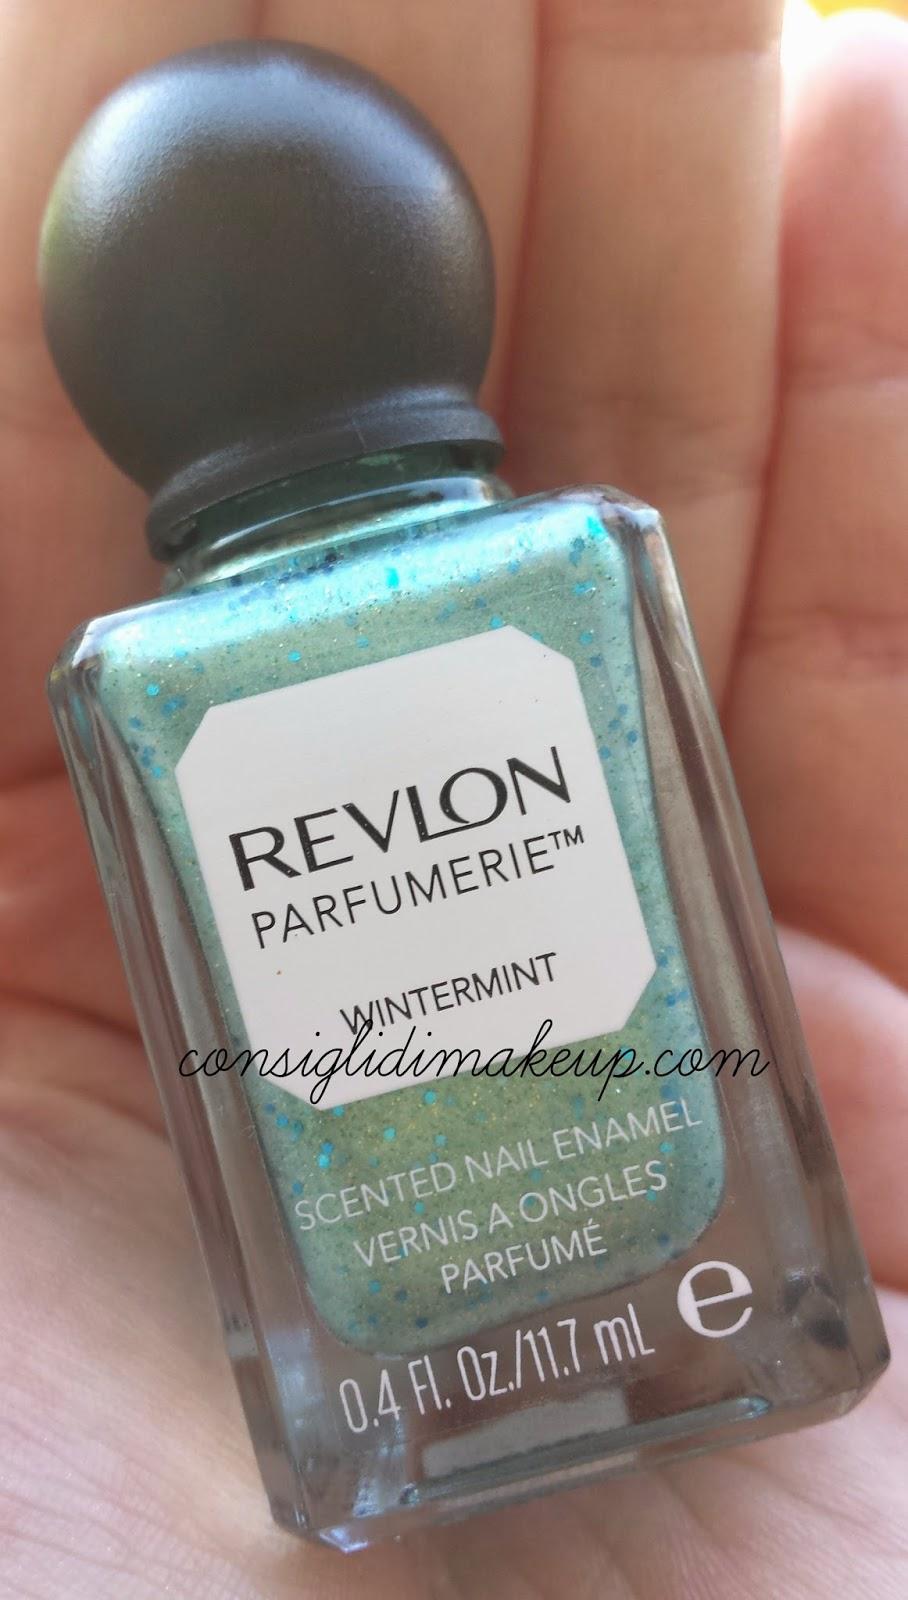 NOTD: Wintermint - Revlon Parfumerie